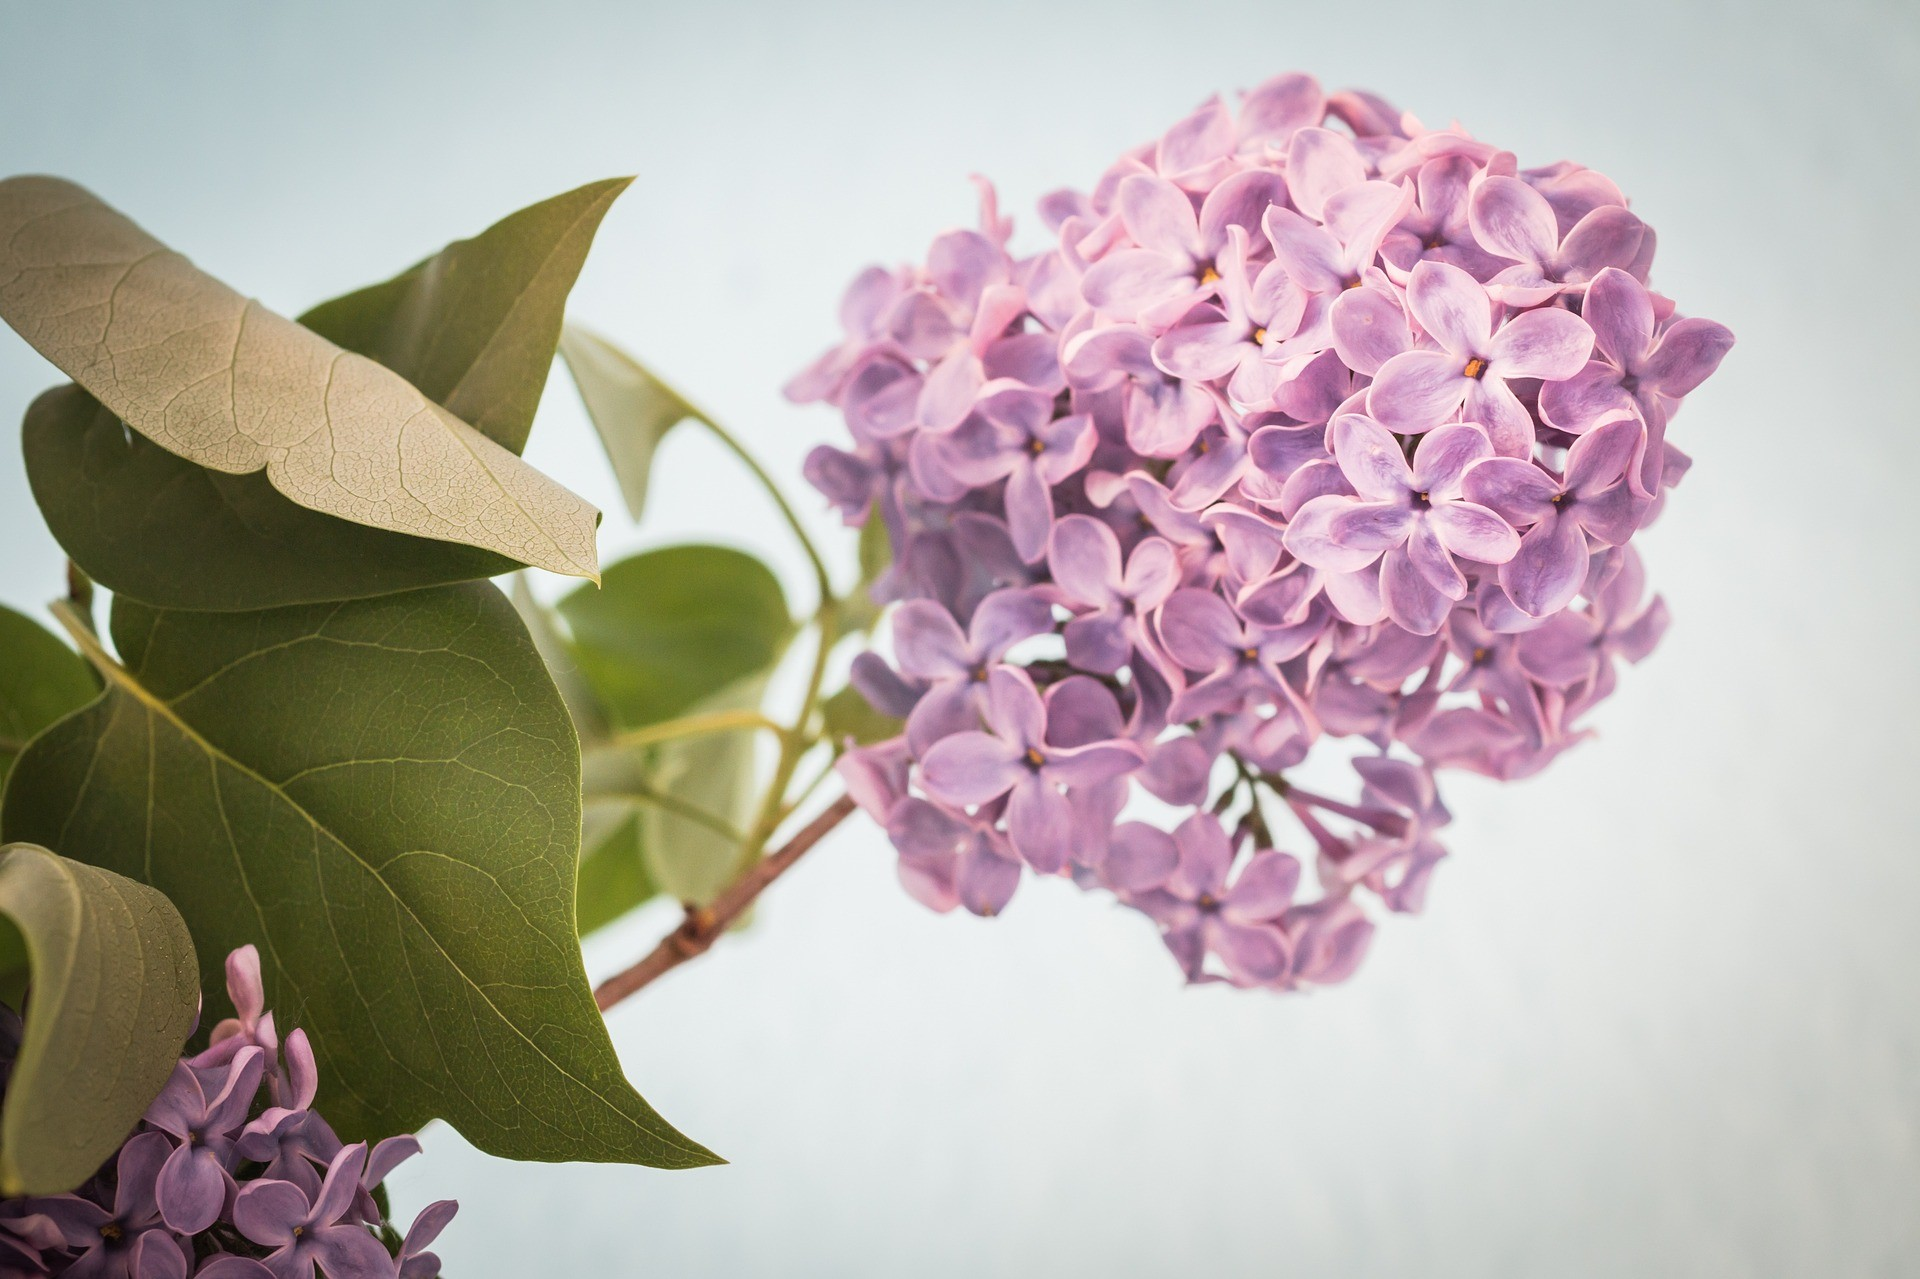 lilac-1392723_1920